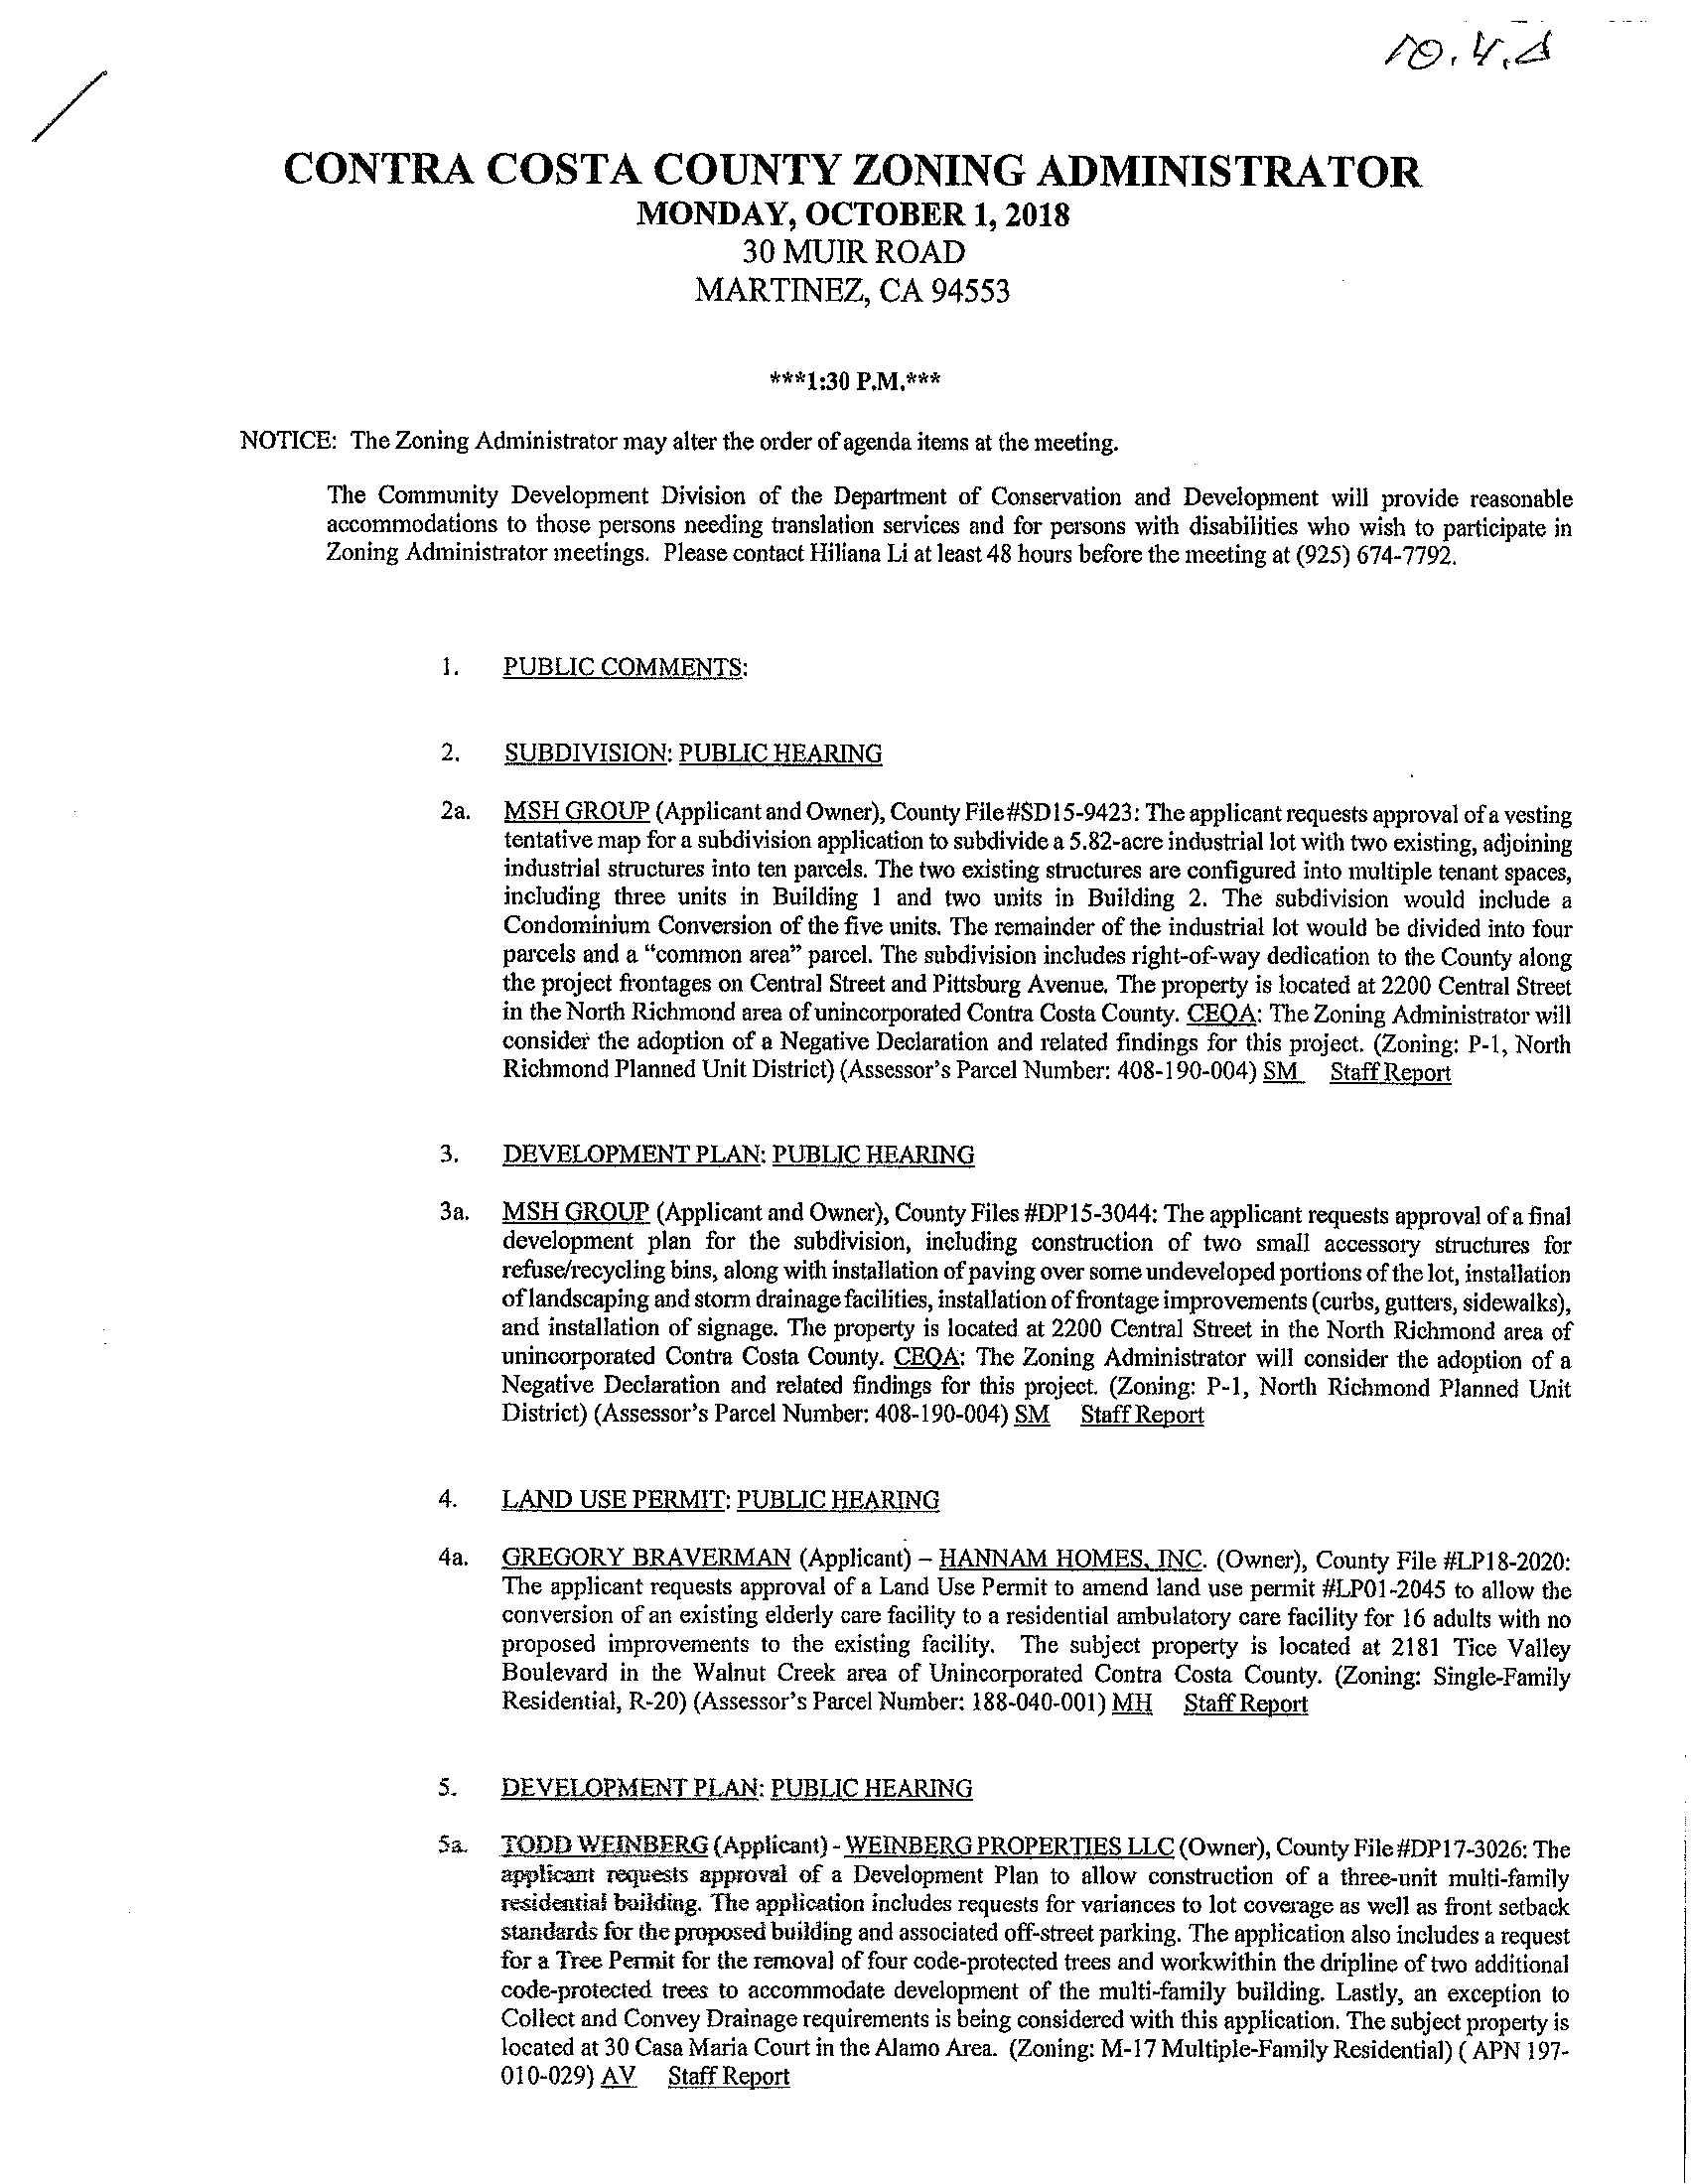 ESMAC Agenda 10.10.2018 (32 Pages)_29.jpg